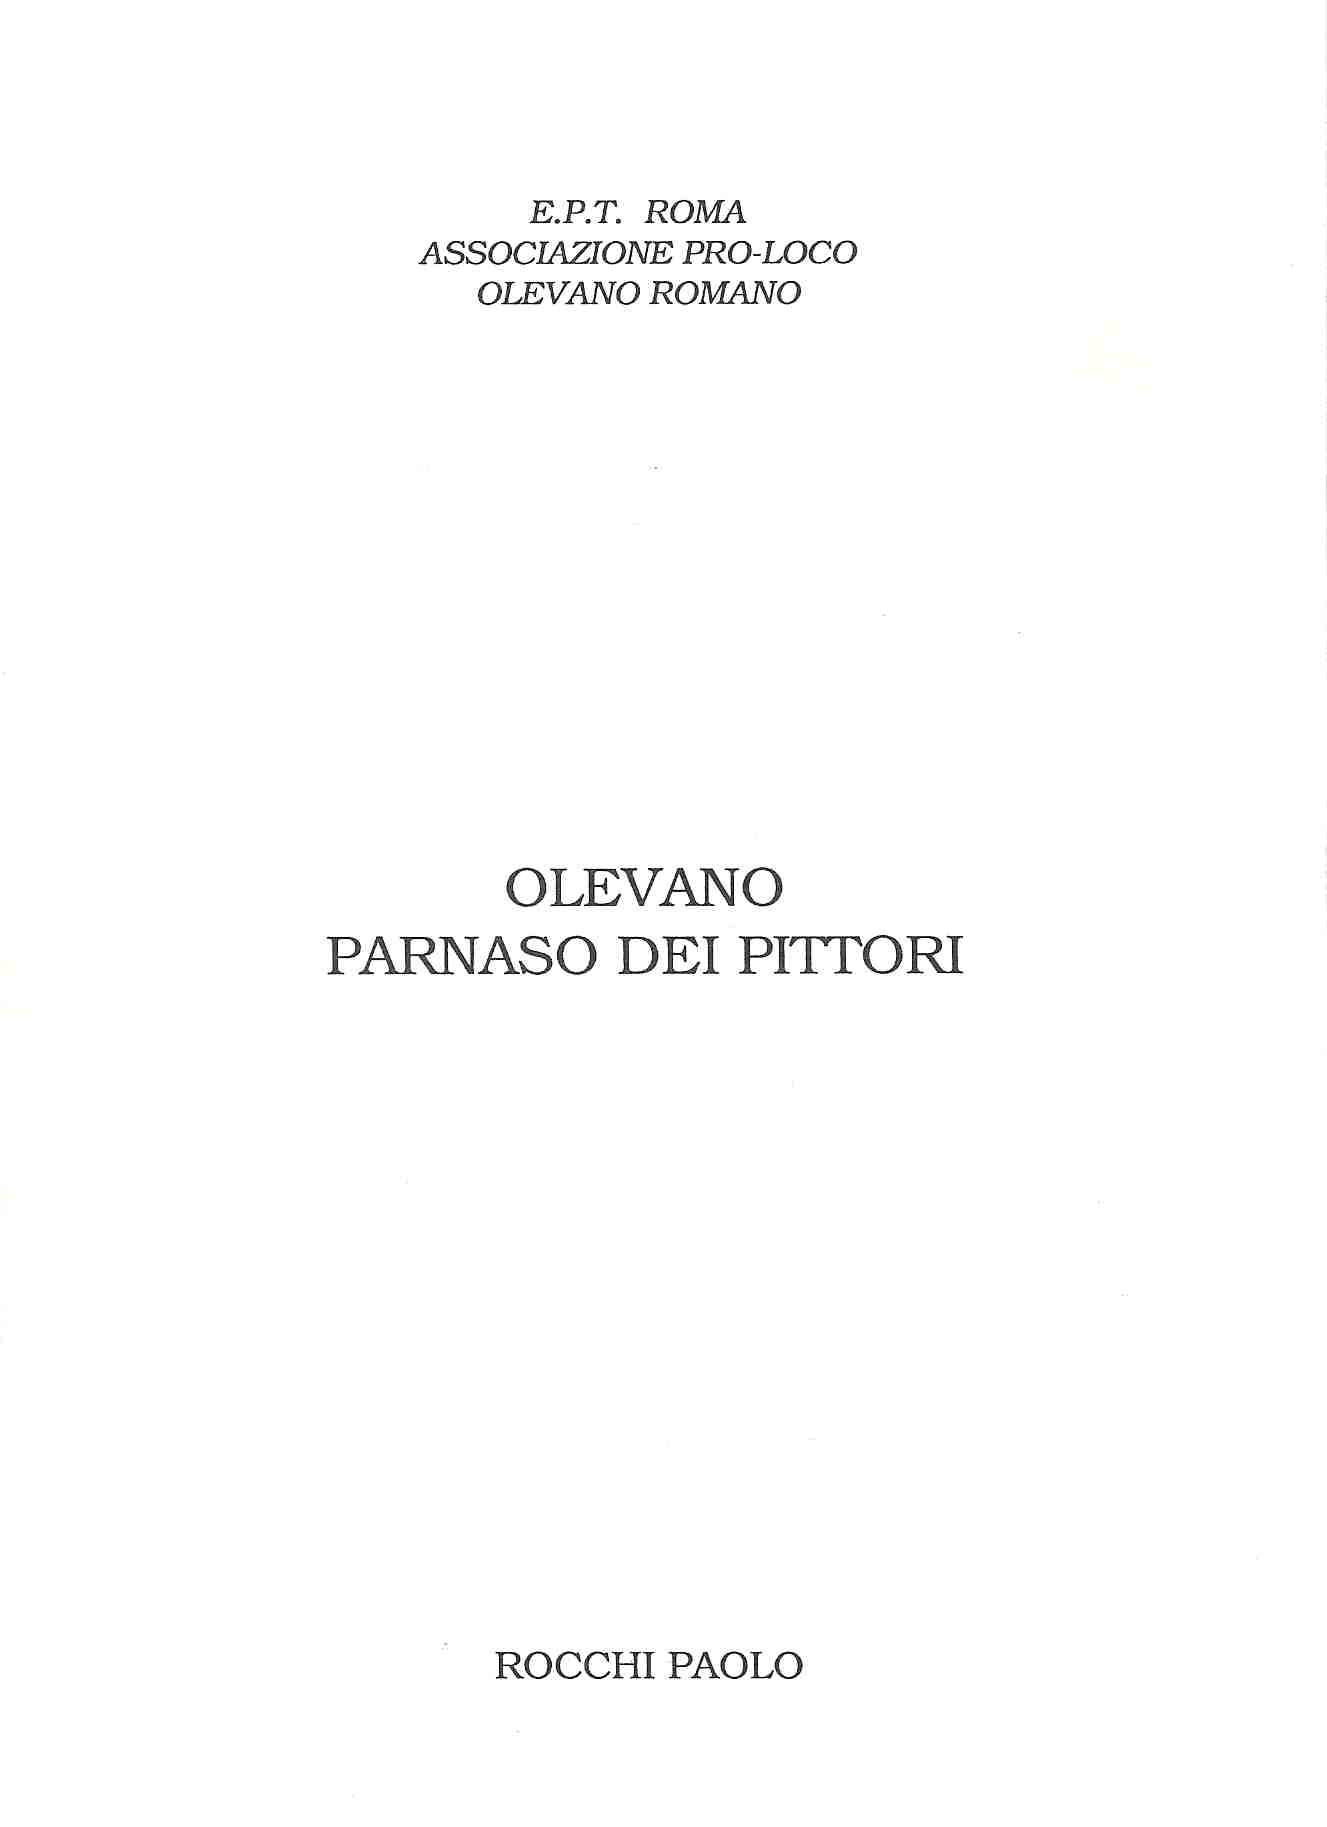 Olevano: Parnaso dei pittori